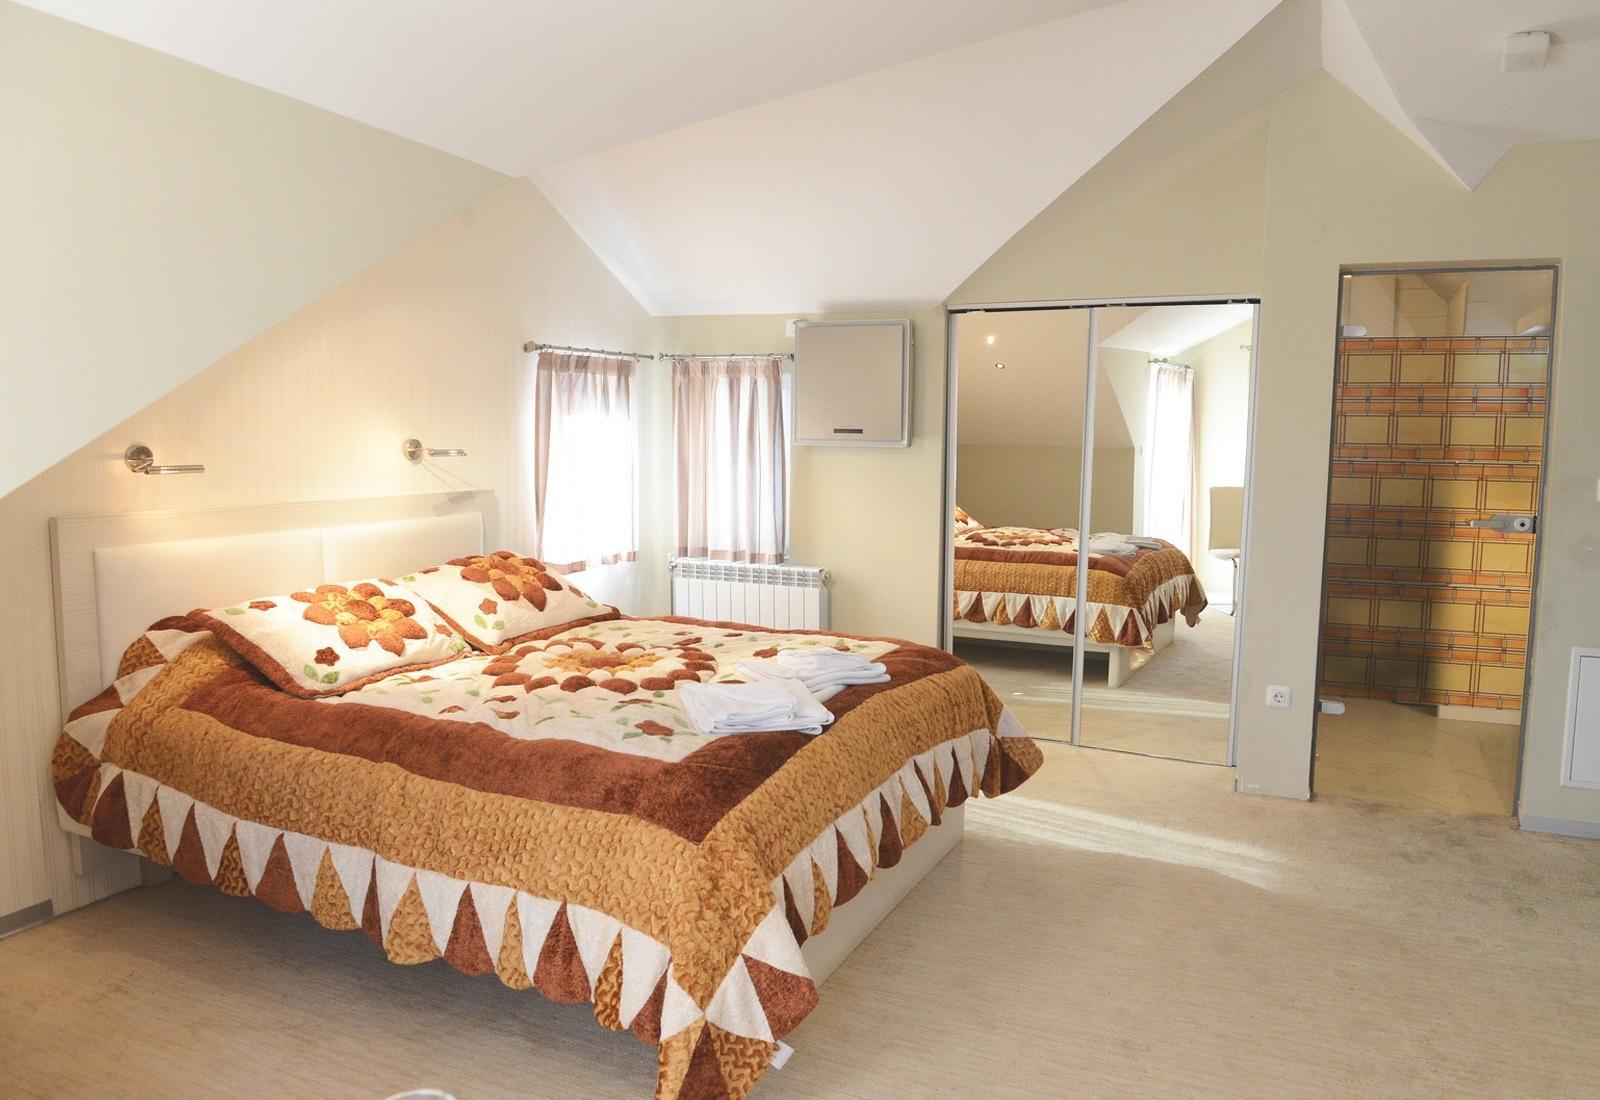 Mola Hotel Room